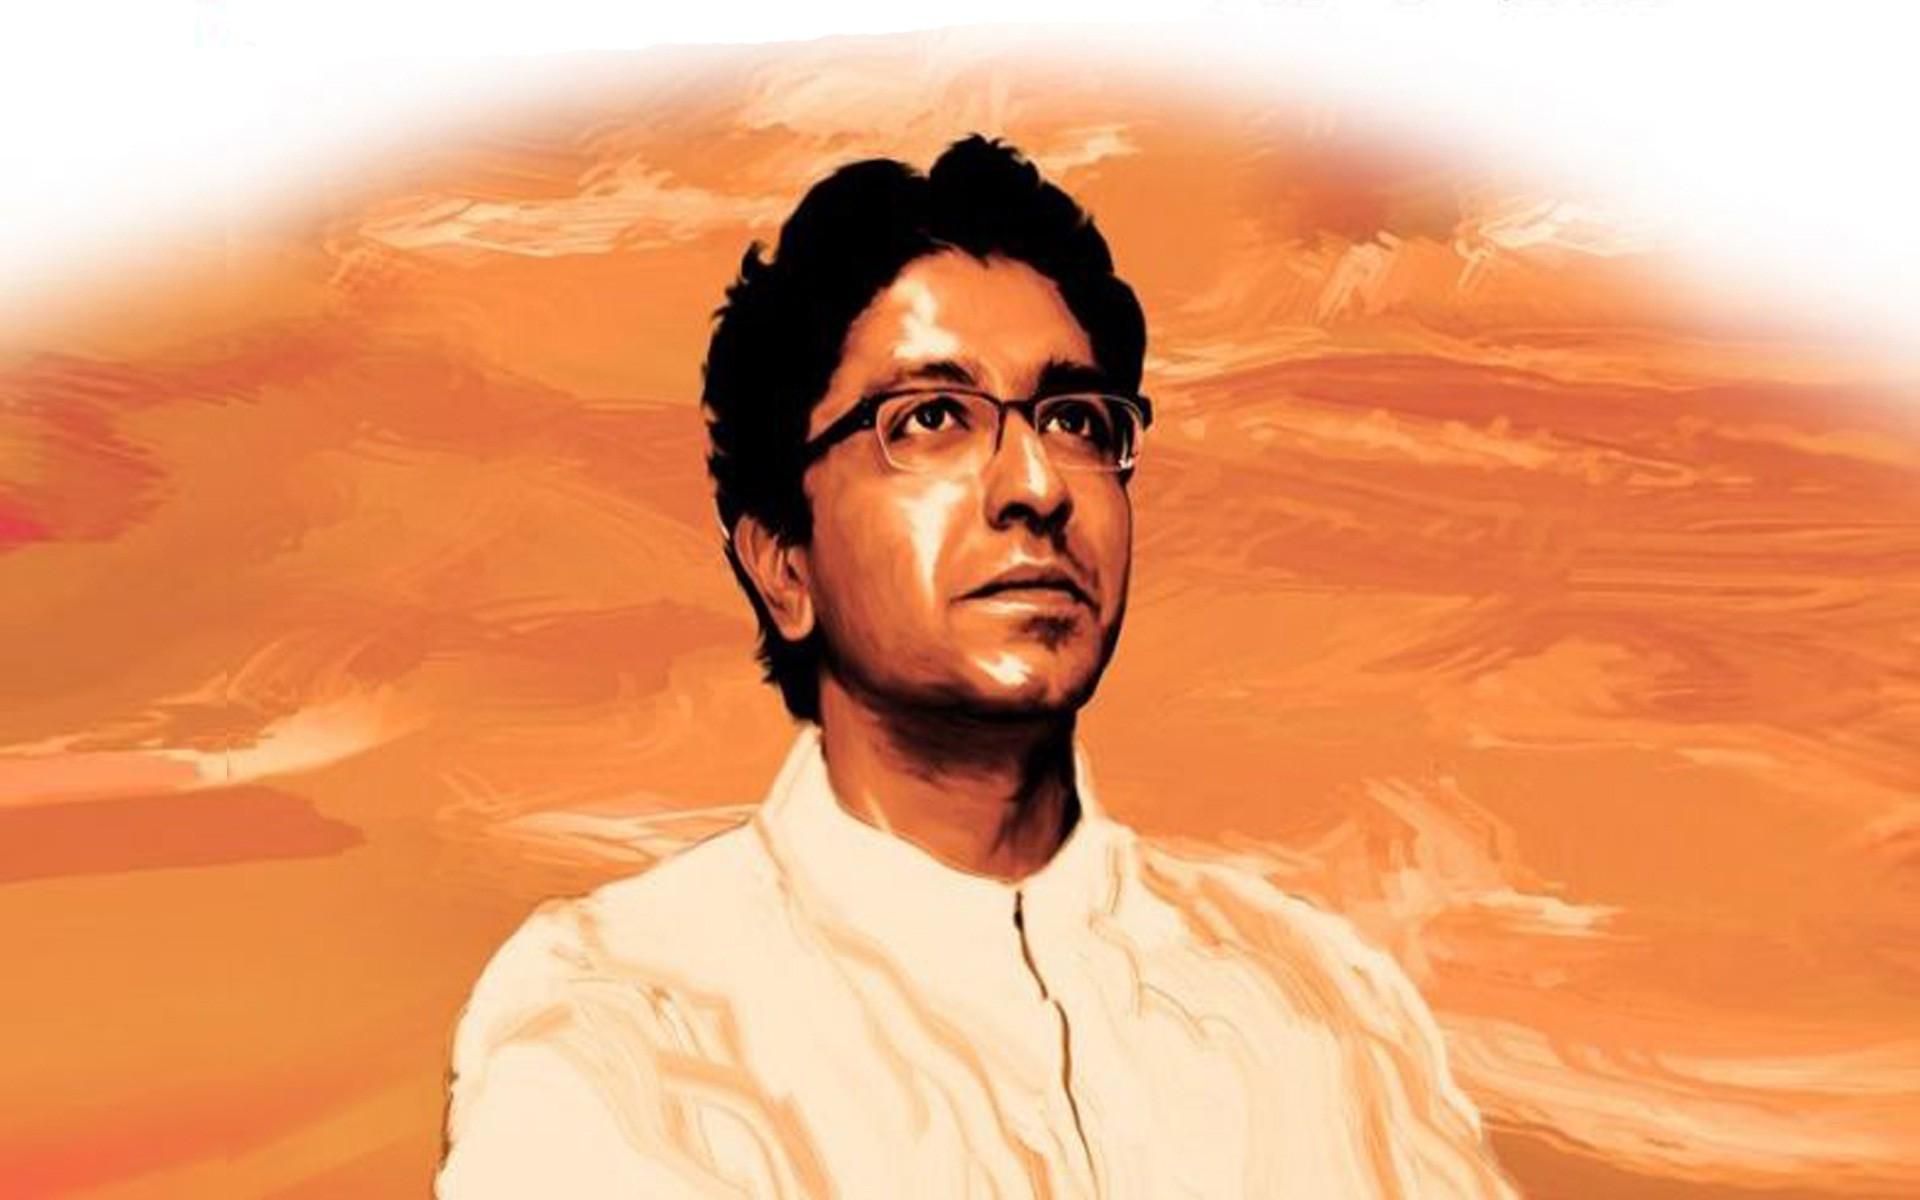 Bal Thackeray Image Download Rh Immerseroyalties Ga